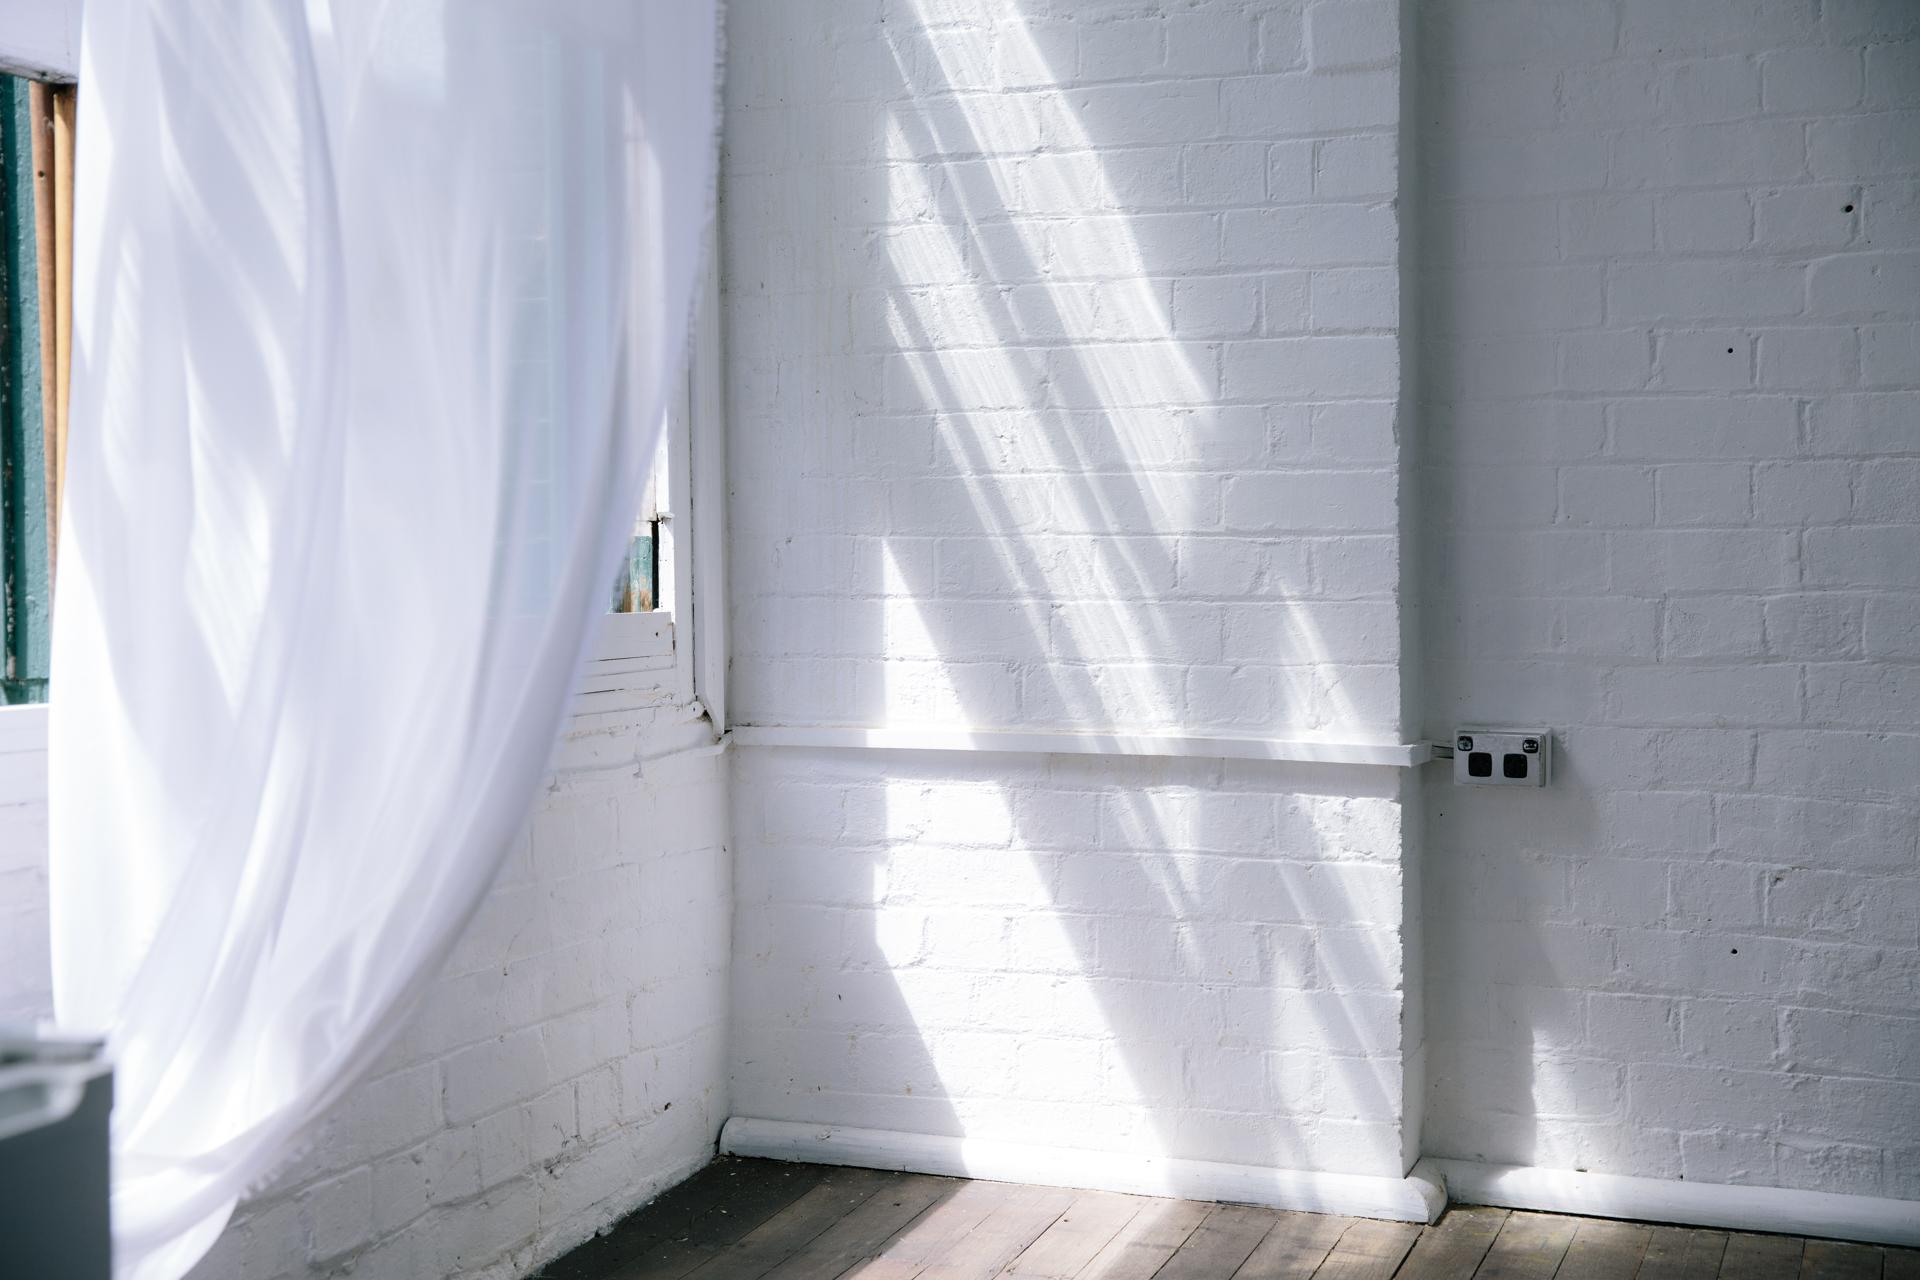 Natural Light Portrat Photography Studio